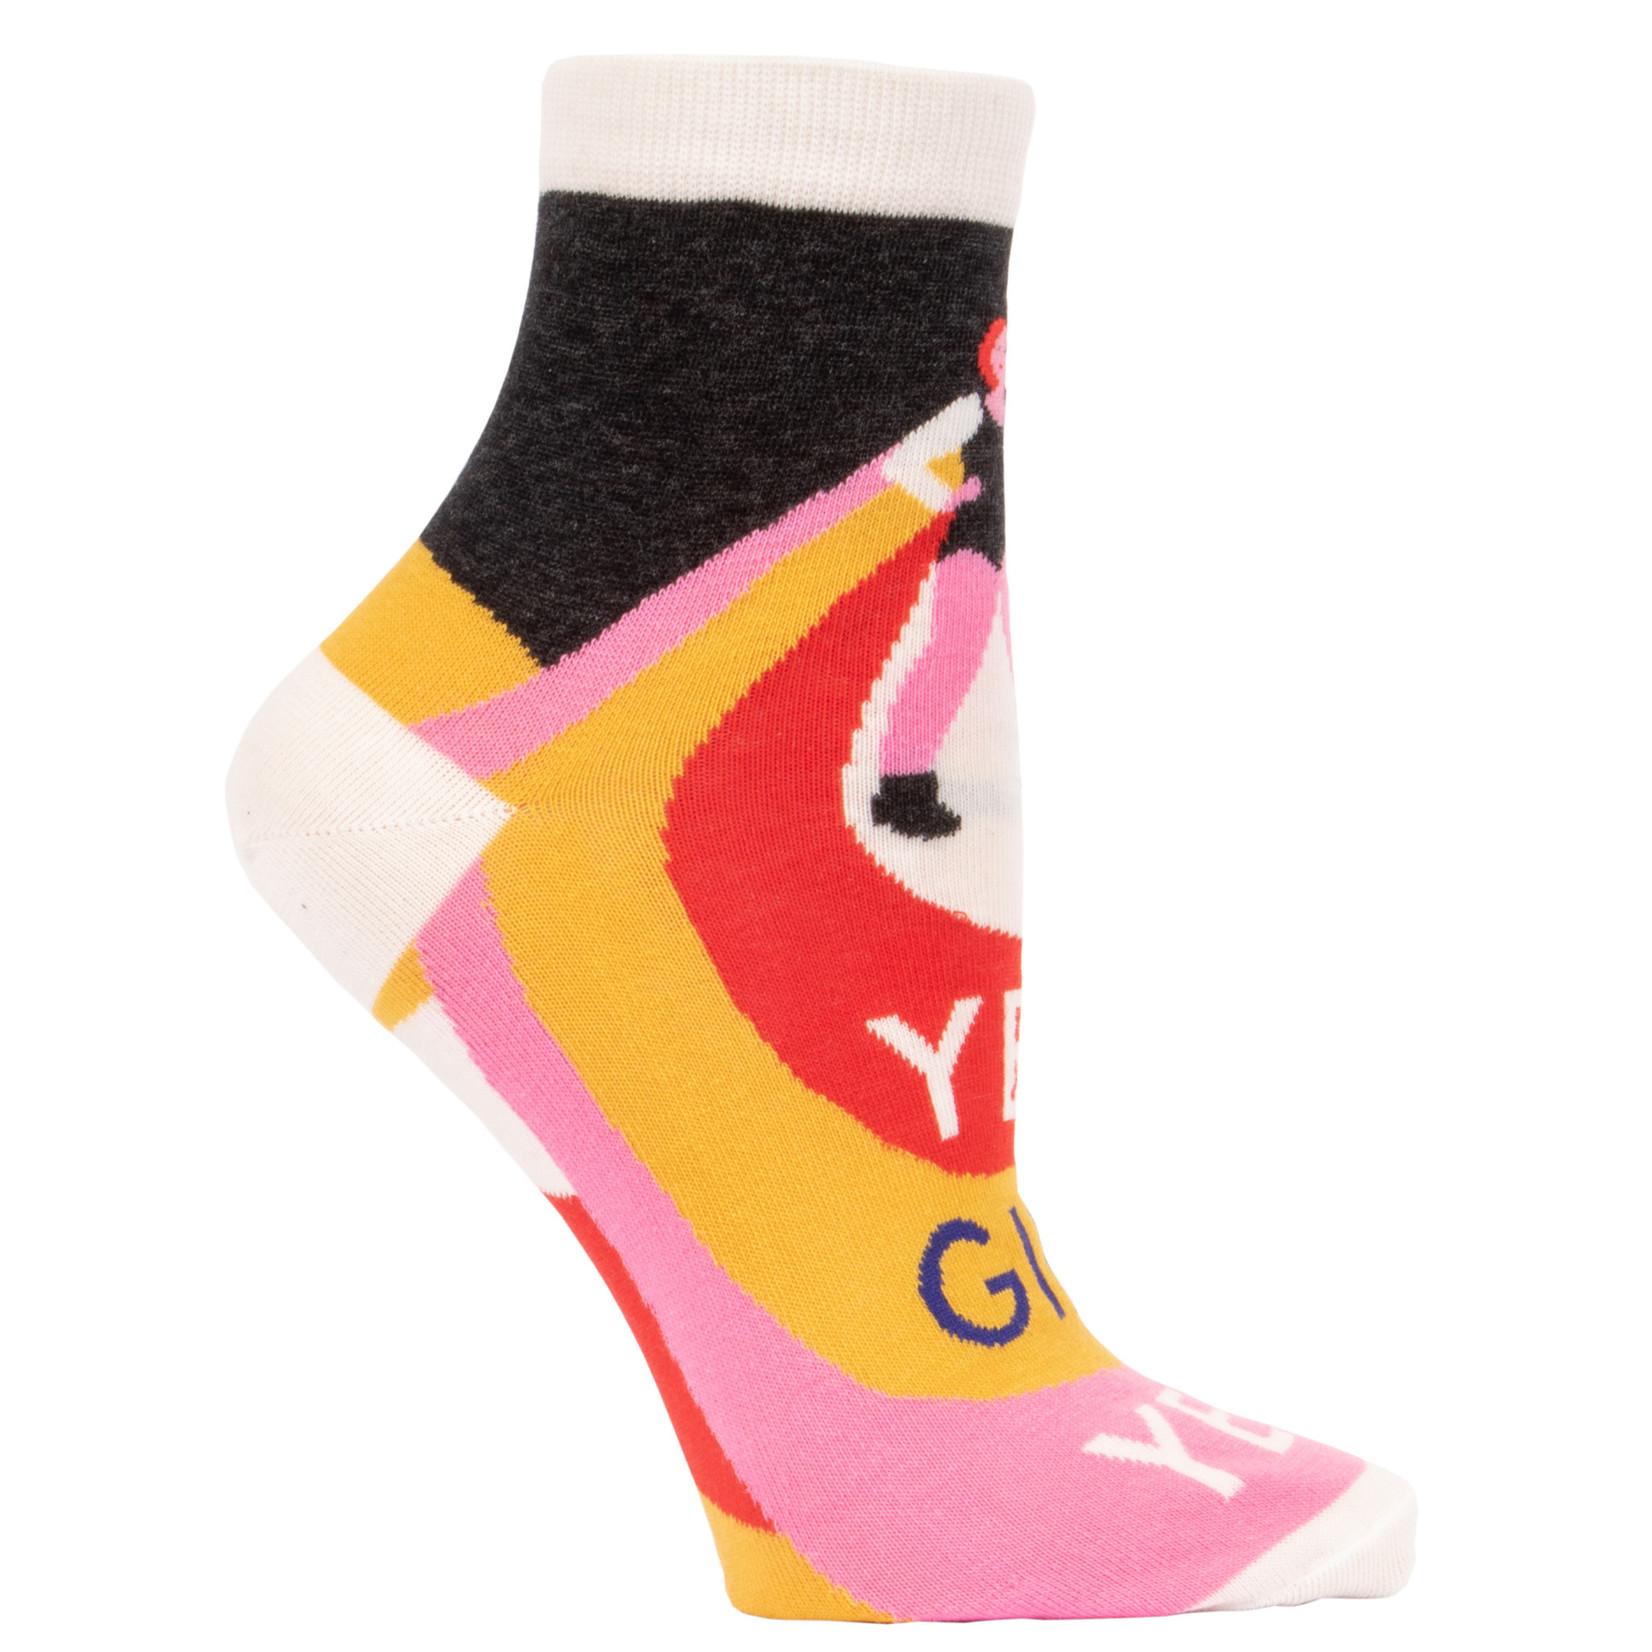 Blue Q Womens Ankle Socks - Yes, Girl, Yes